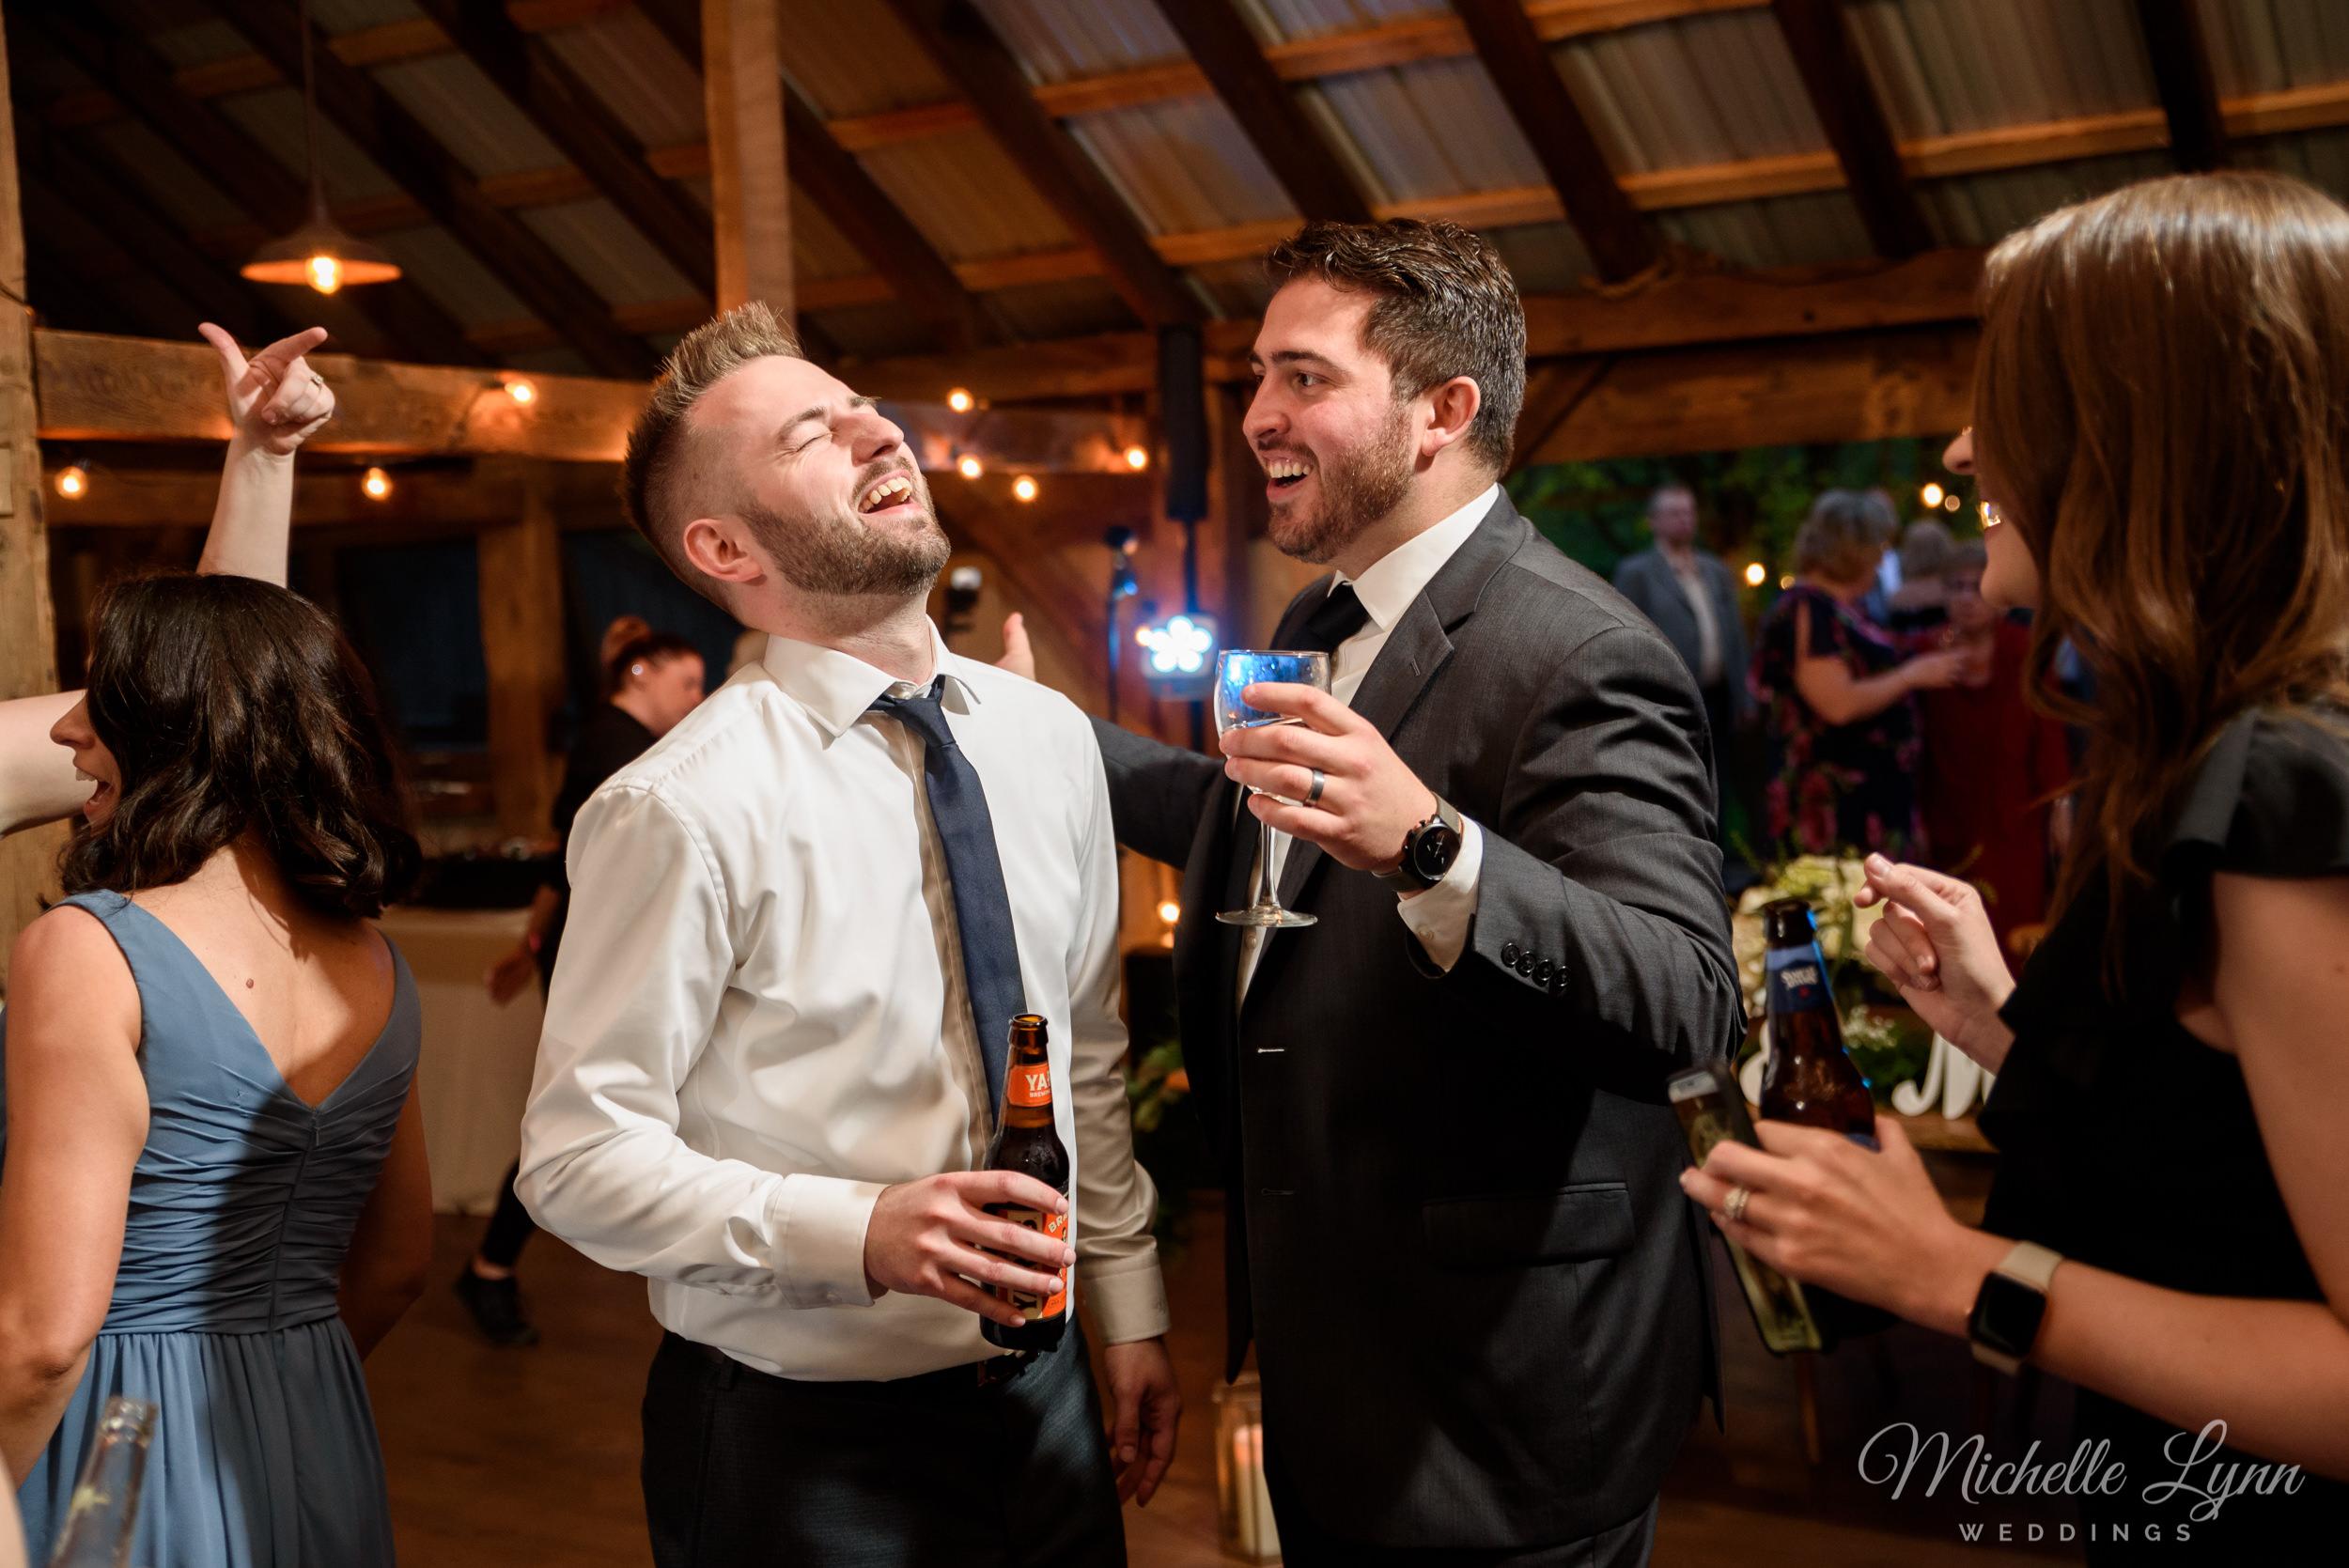 mlw-the-farm-bakery-and-events-wedding-photos-80.jpg